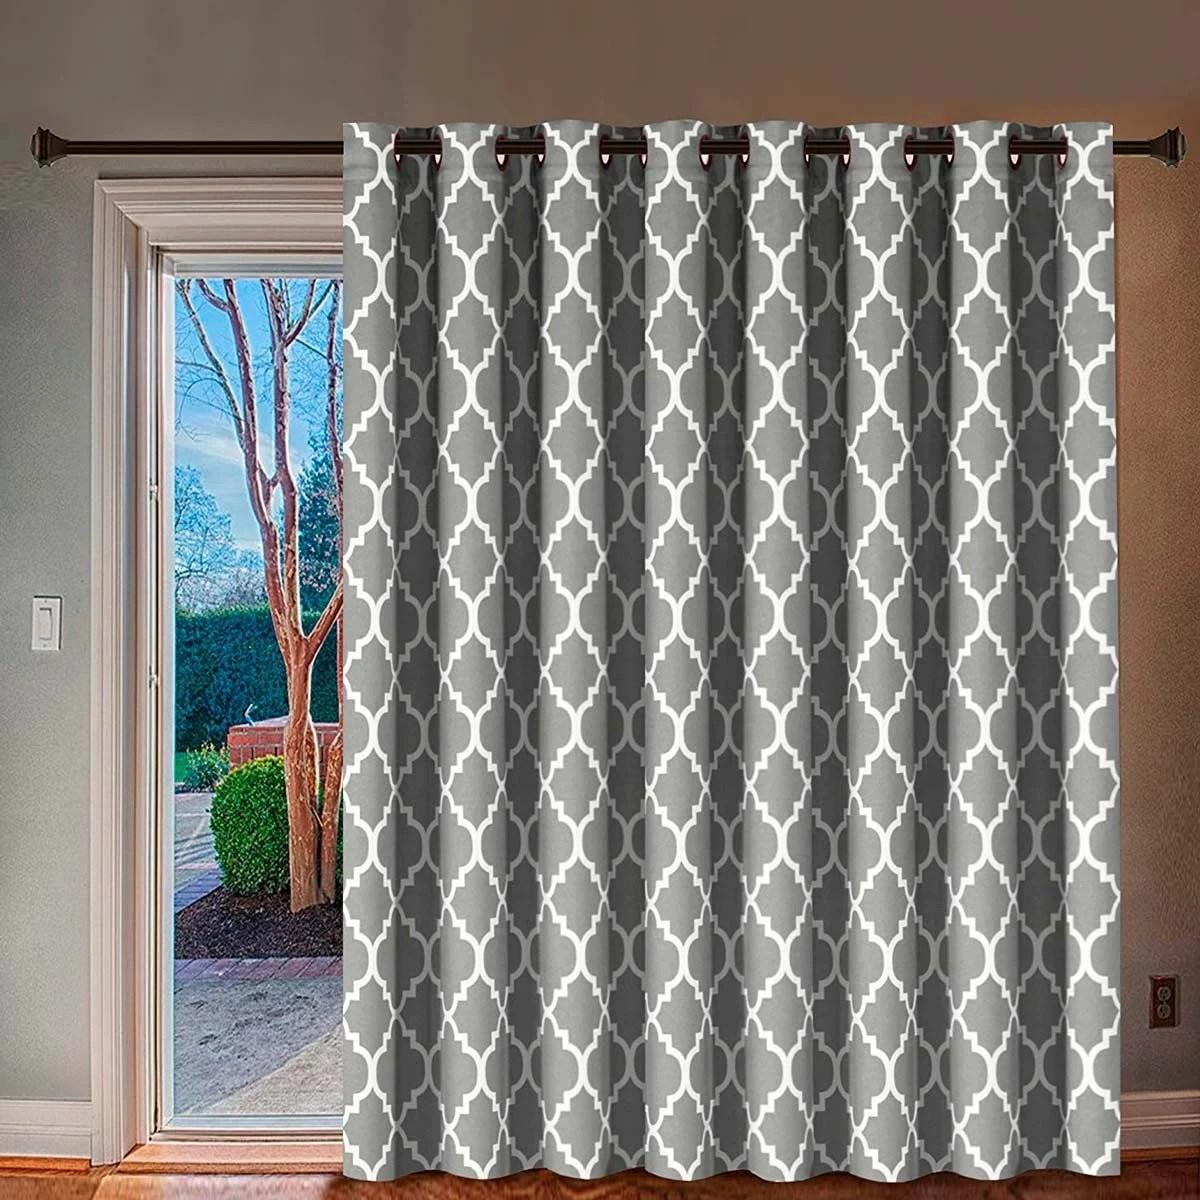 patio door curtain ideas for different